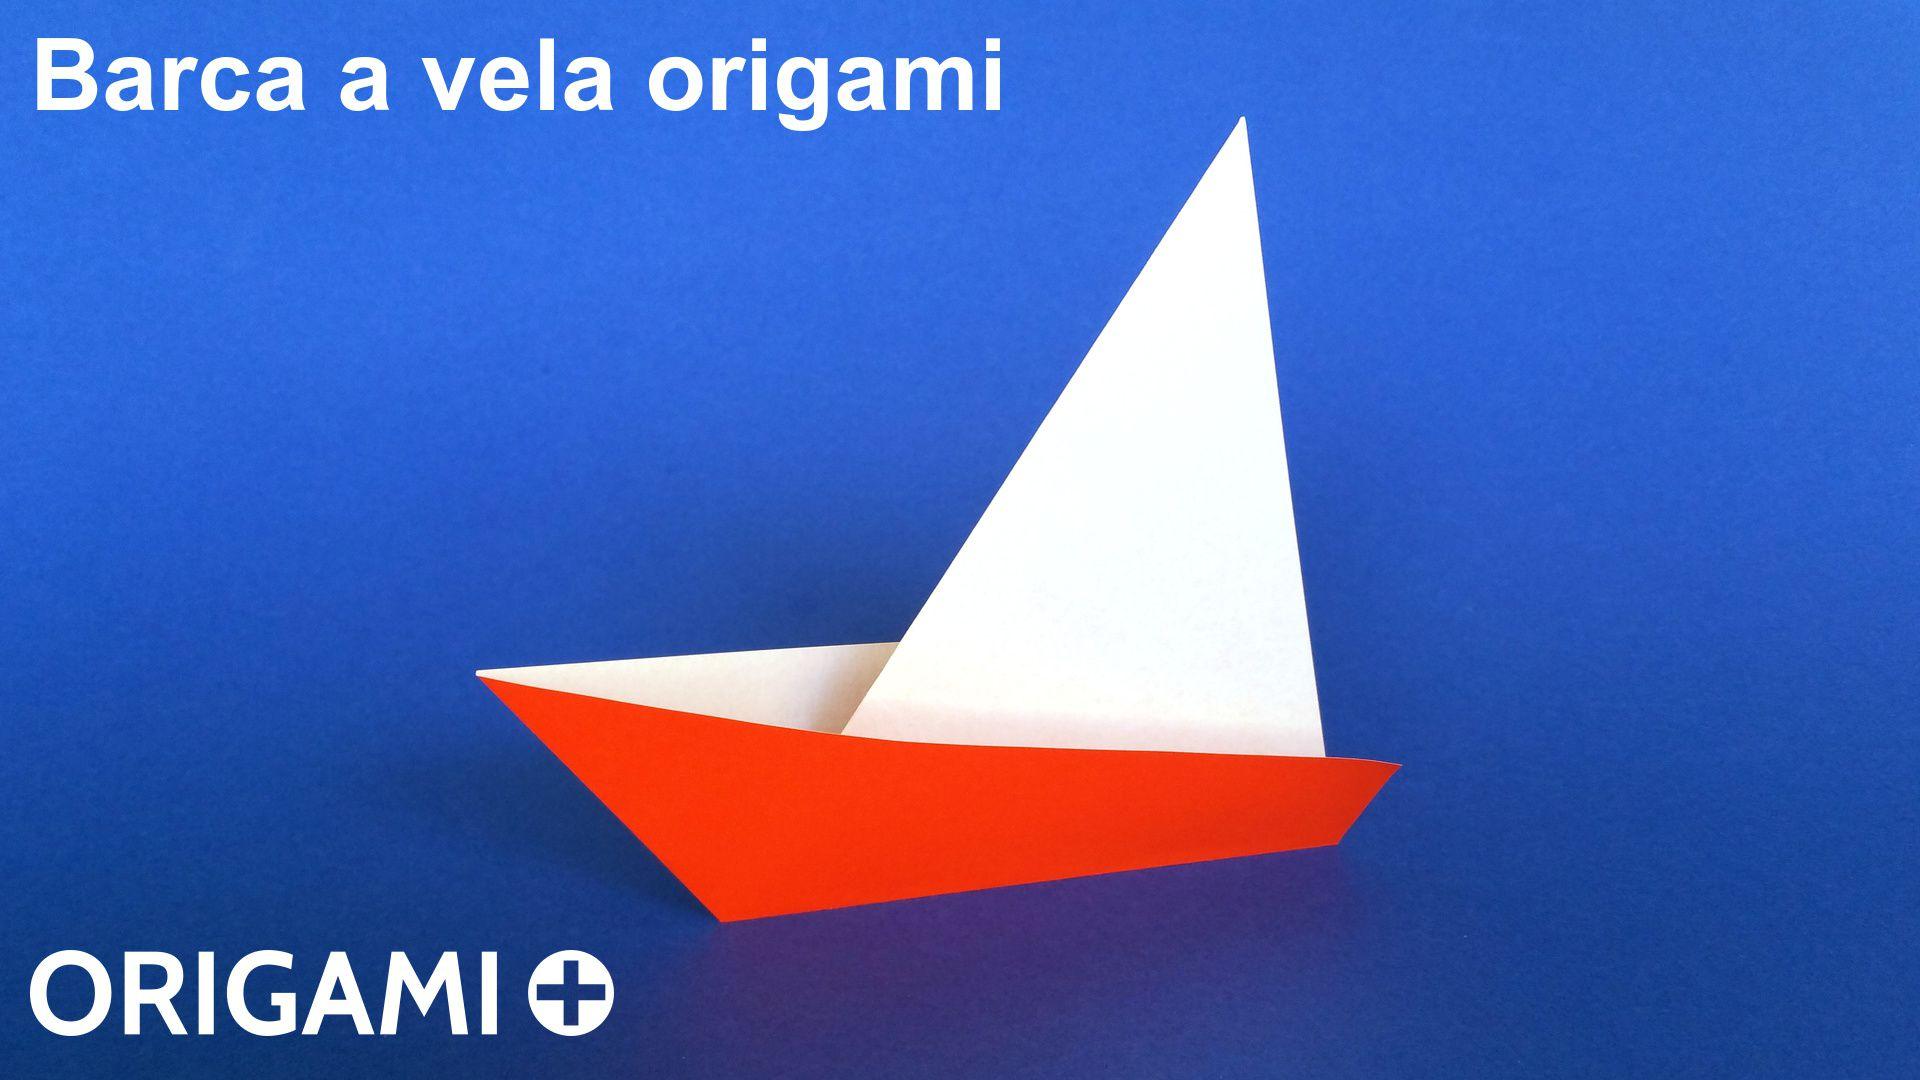 Barca a vela origami